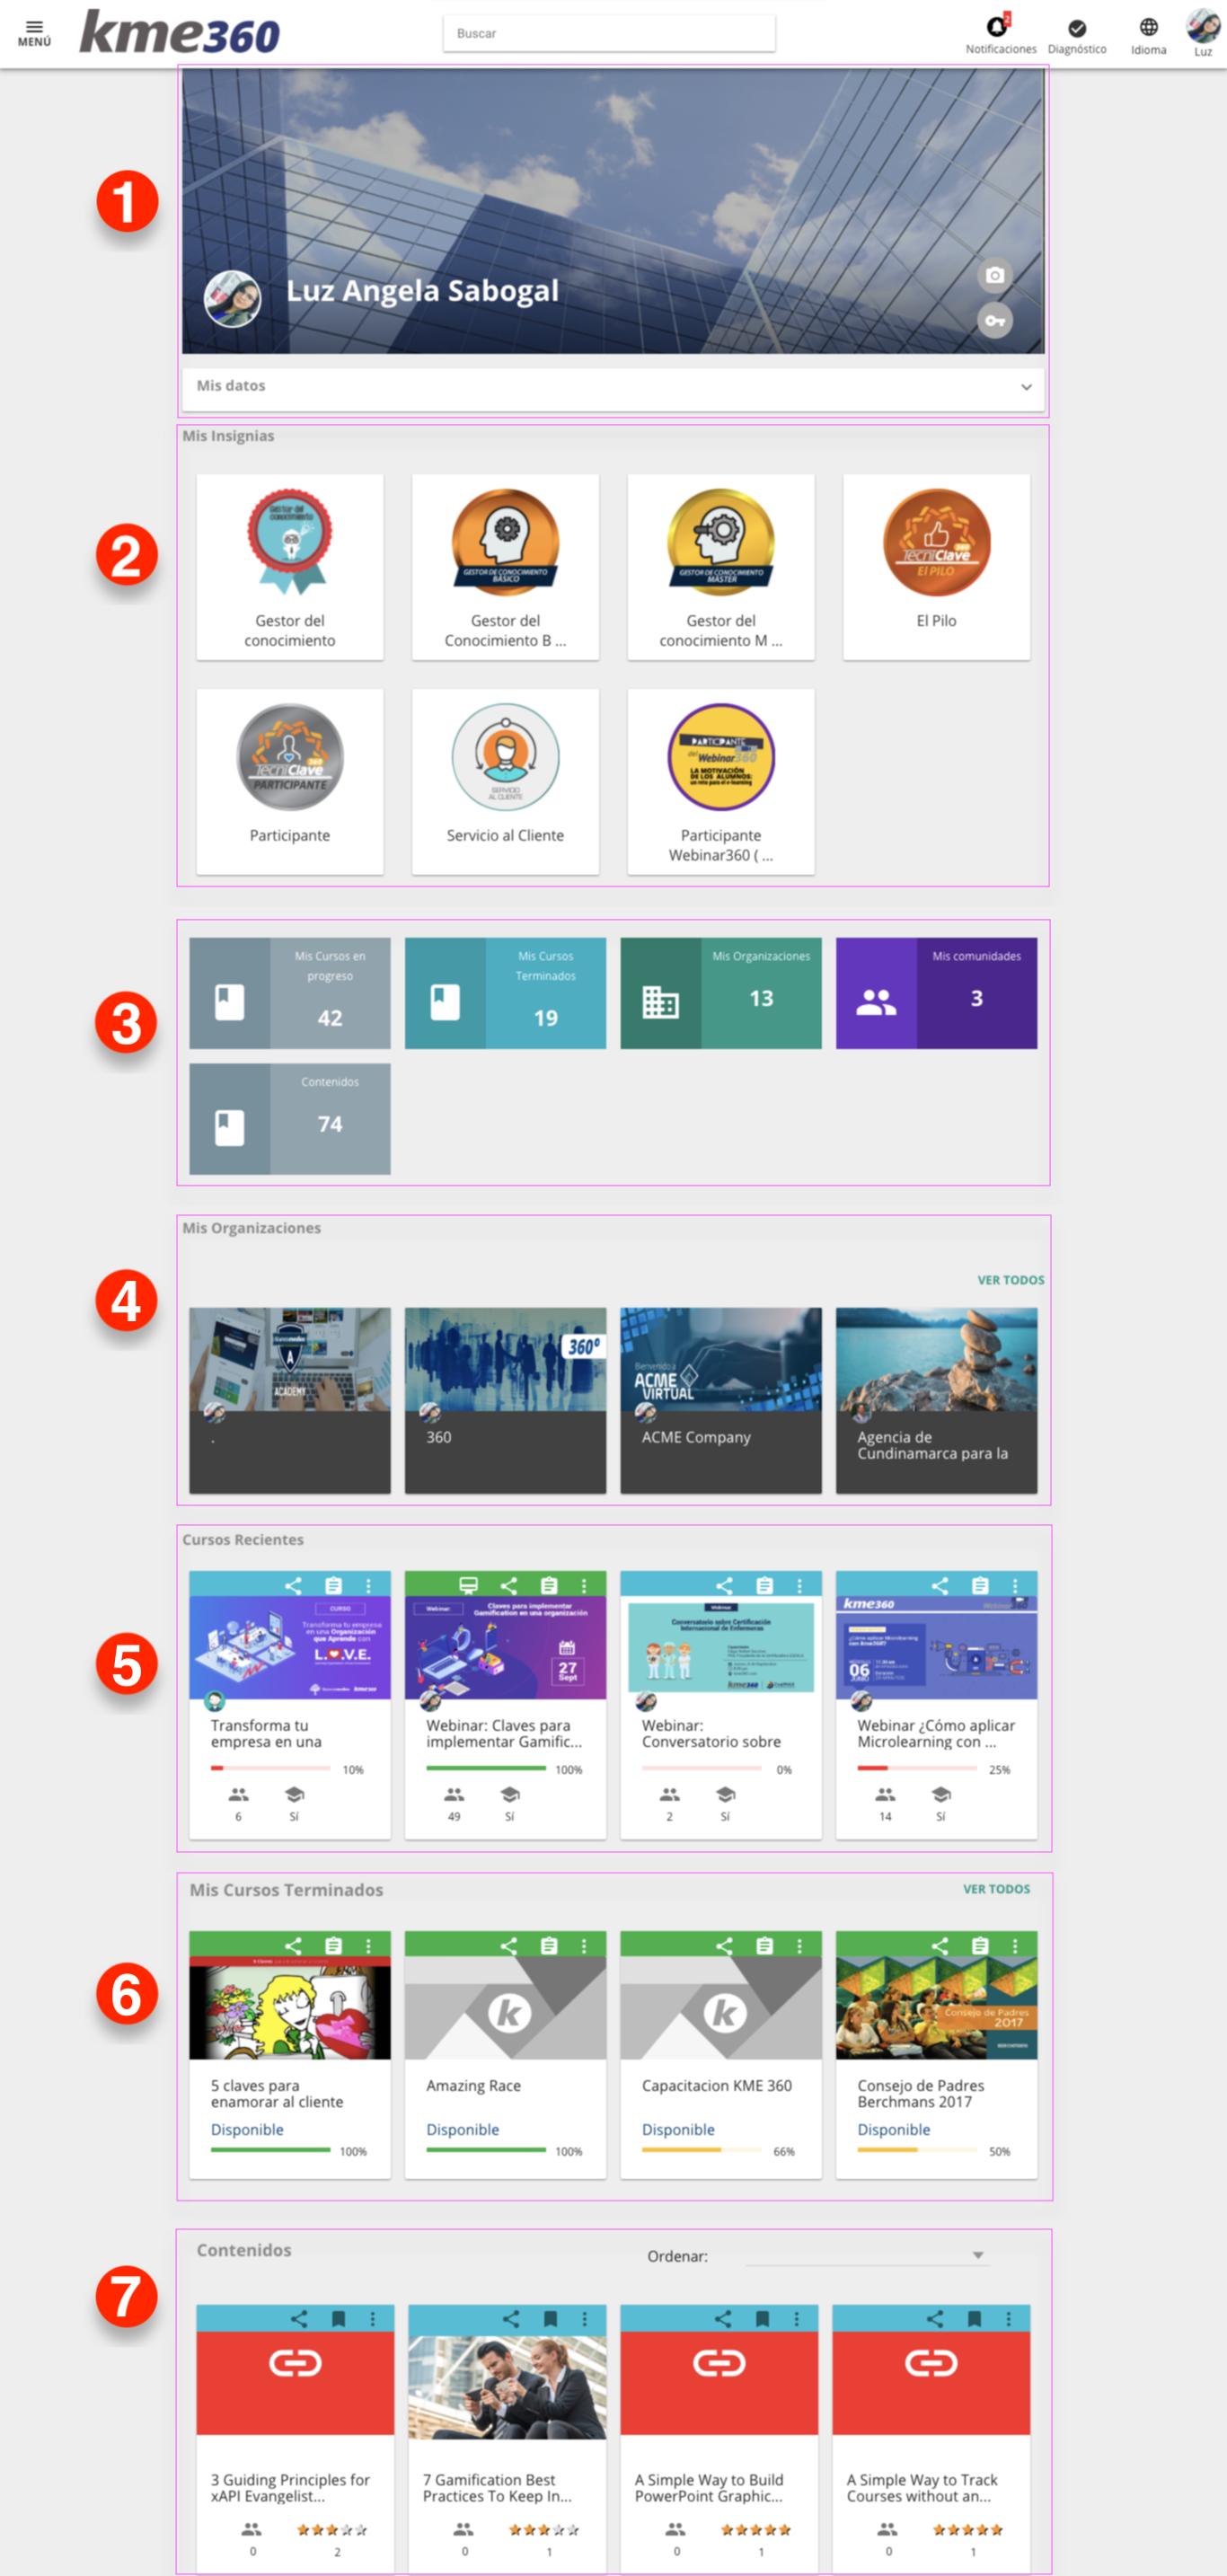 screencapture-kme360-profiles-profile-adminpruebas-2018-10-22-17_28_29.png